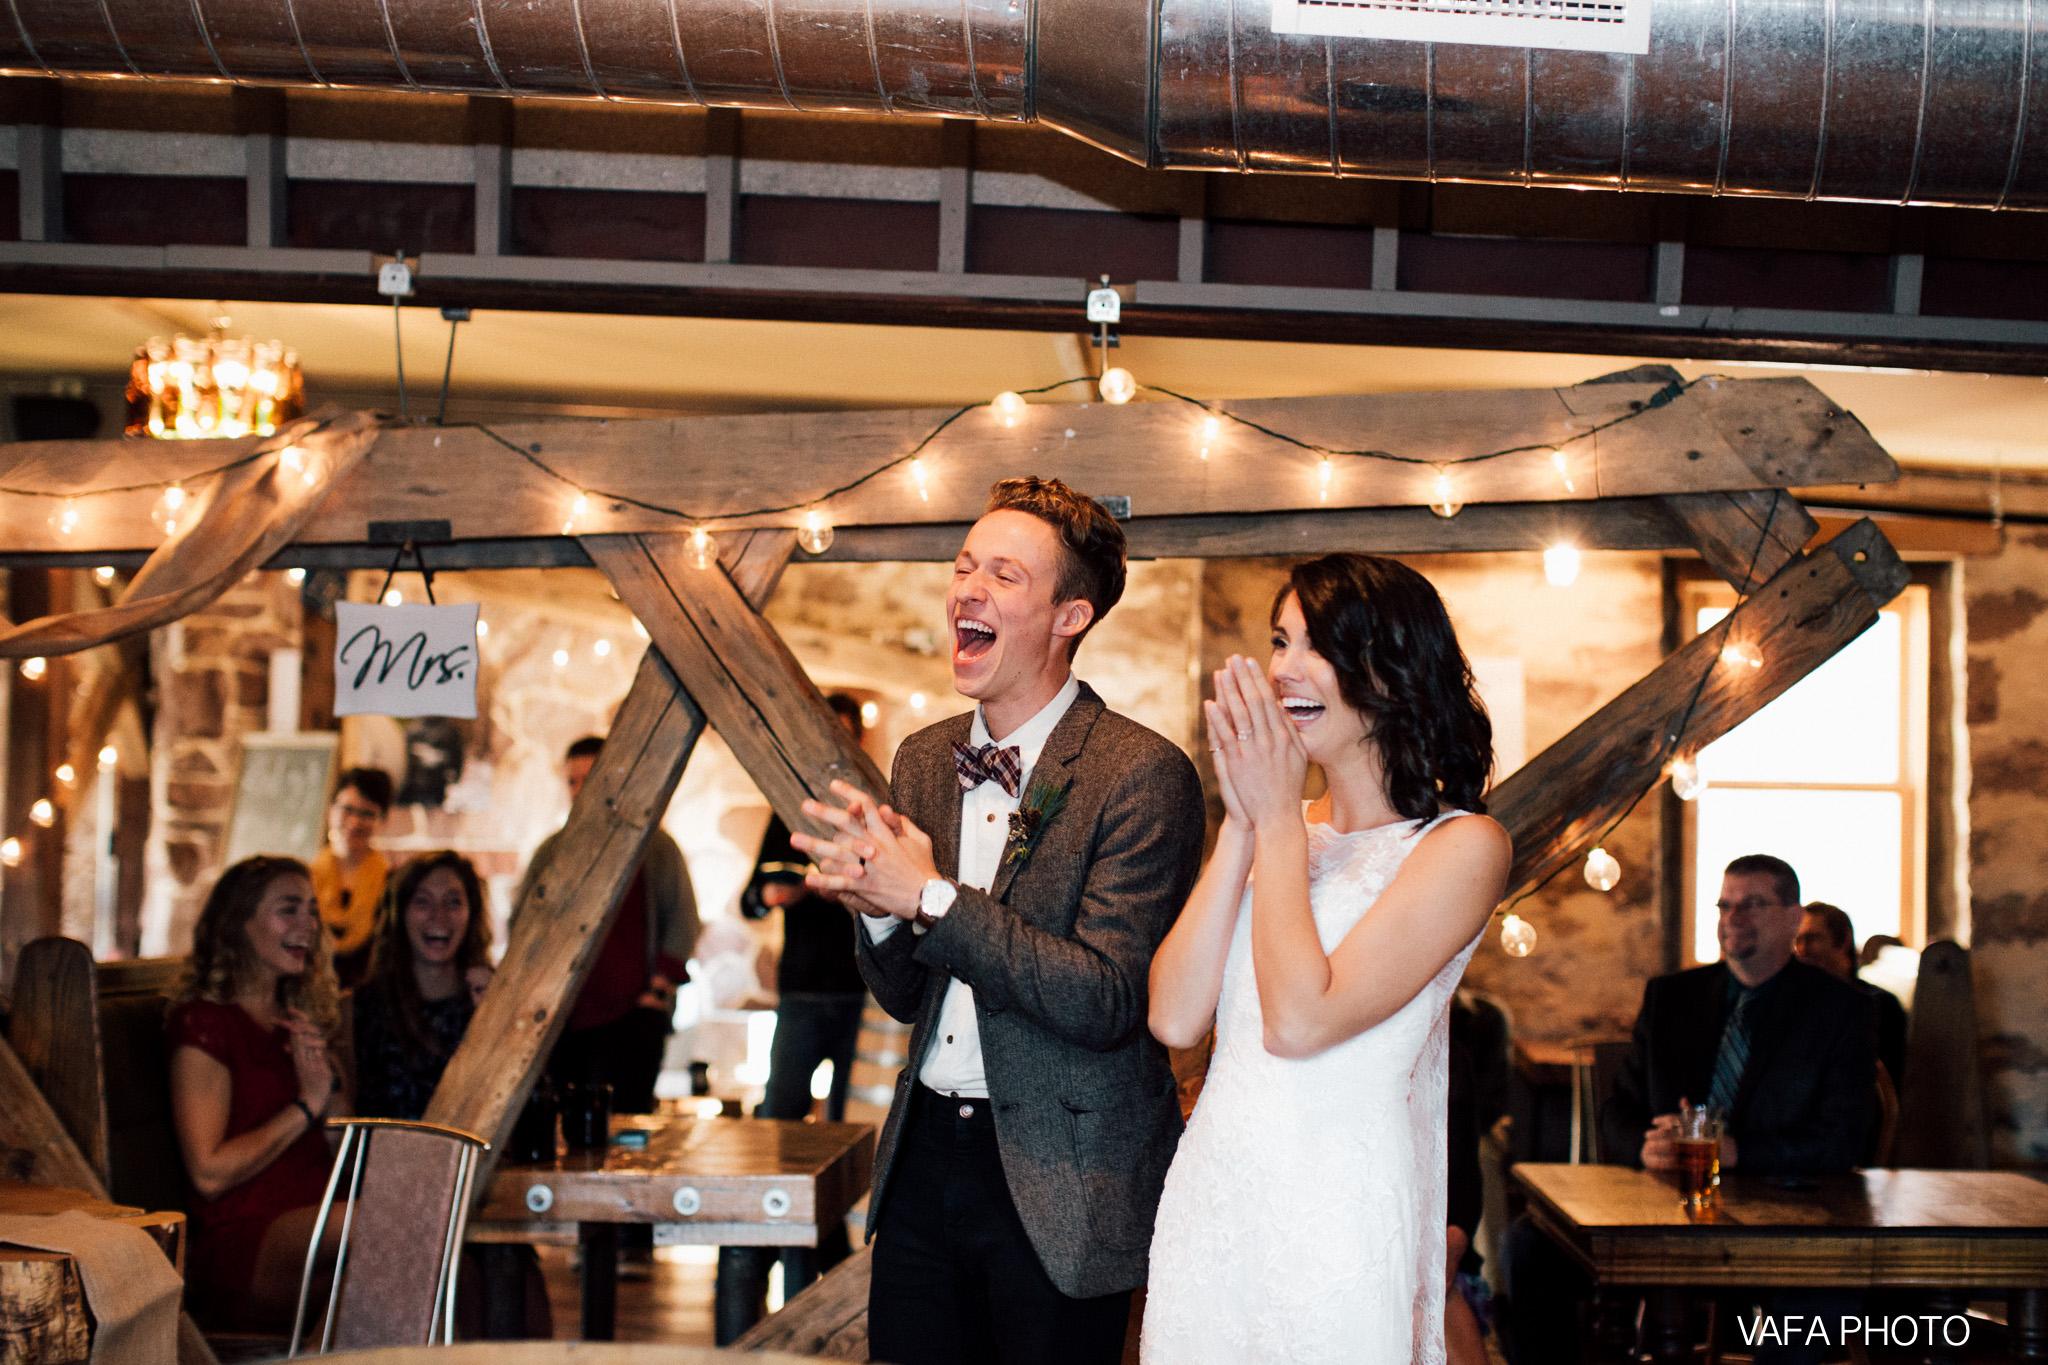 Hogback-Mountain-Wedding-Chelsea-Josh-Vafa-Photo-821.jpg